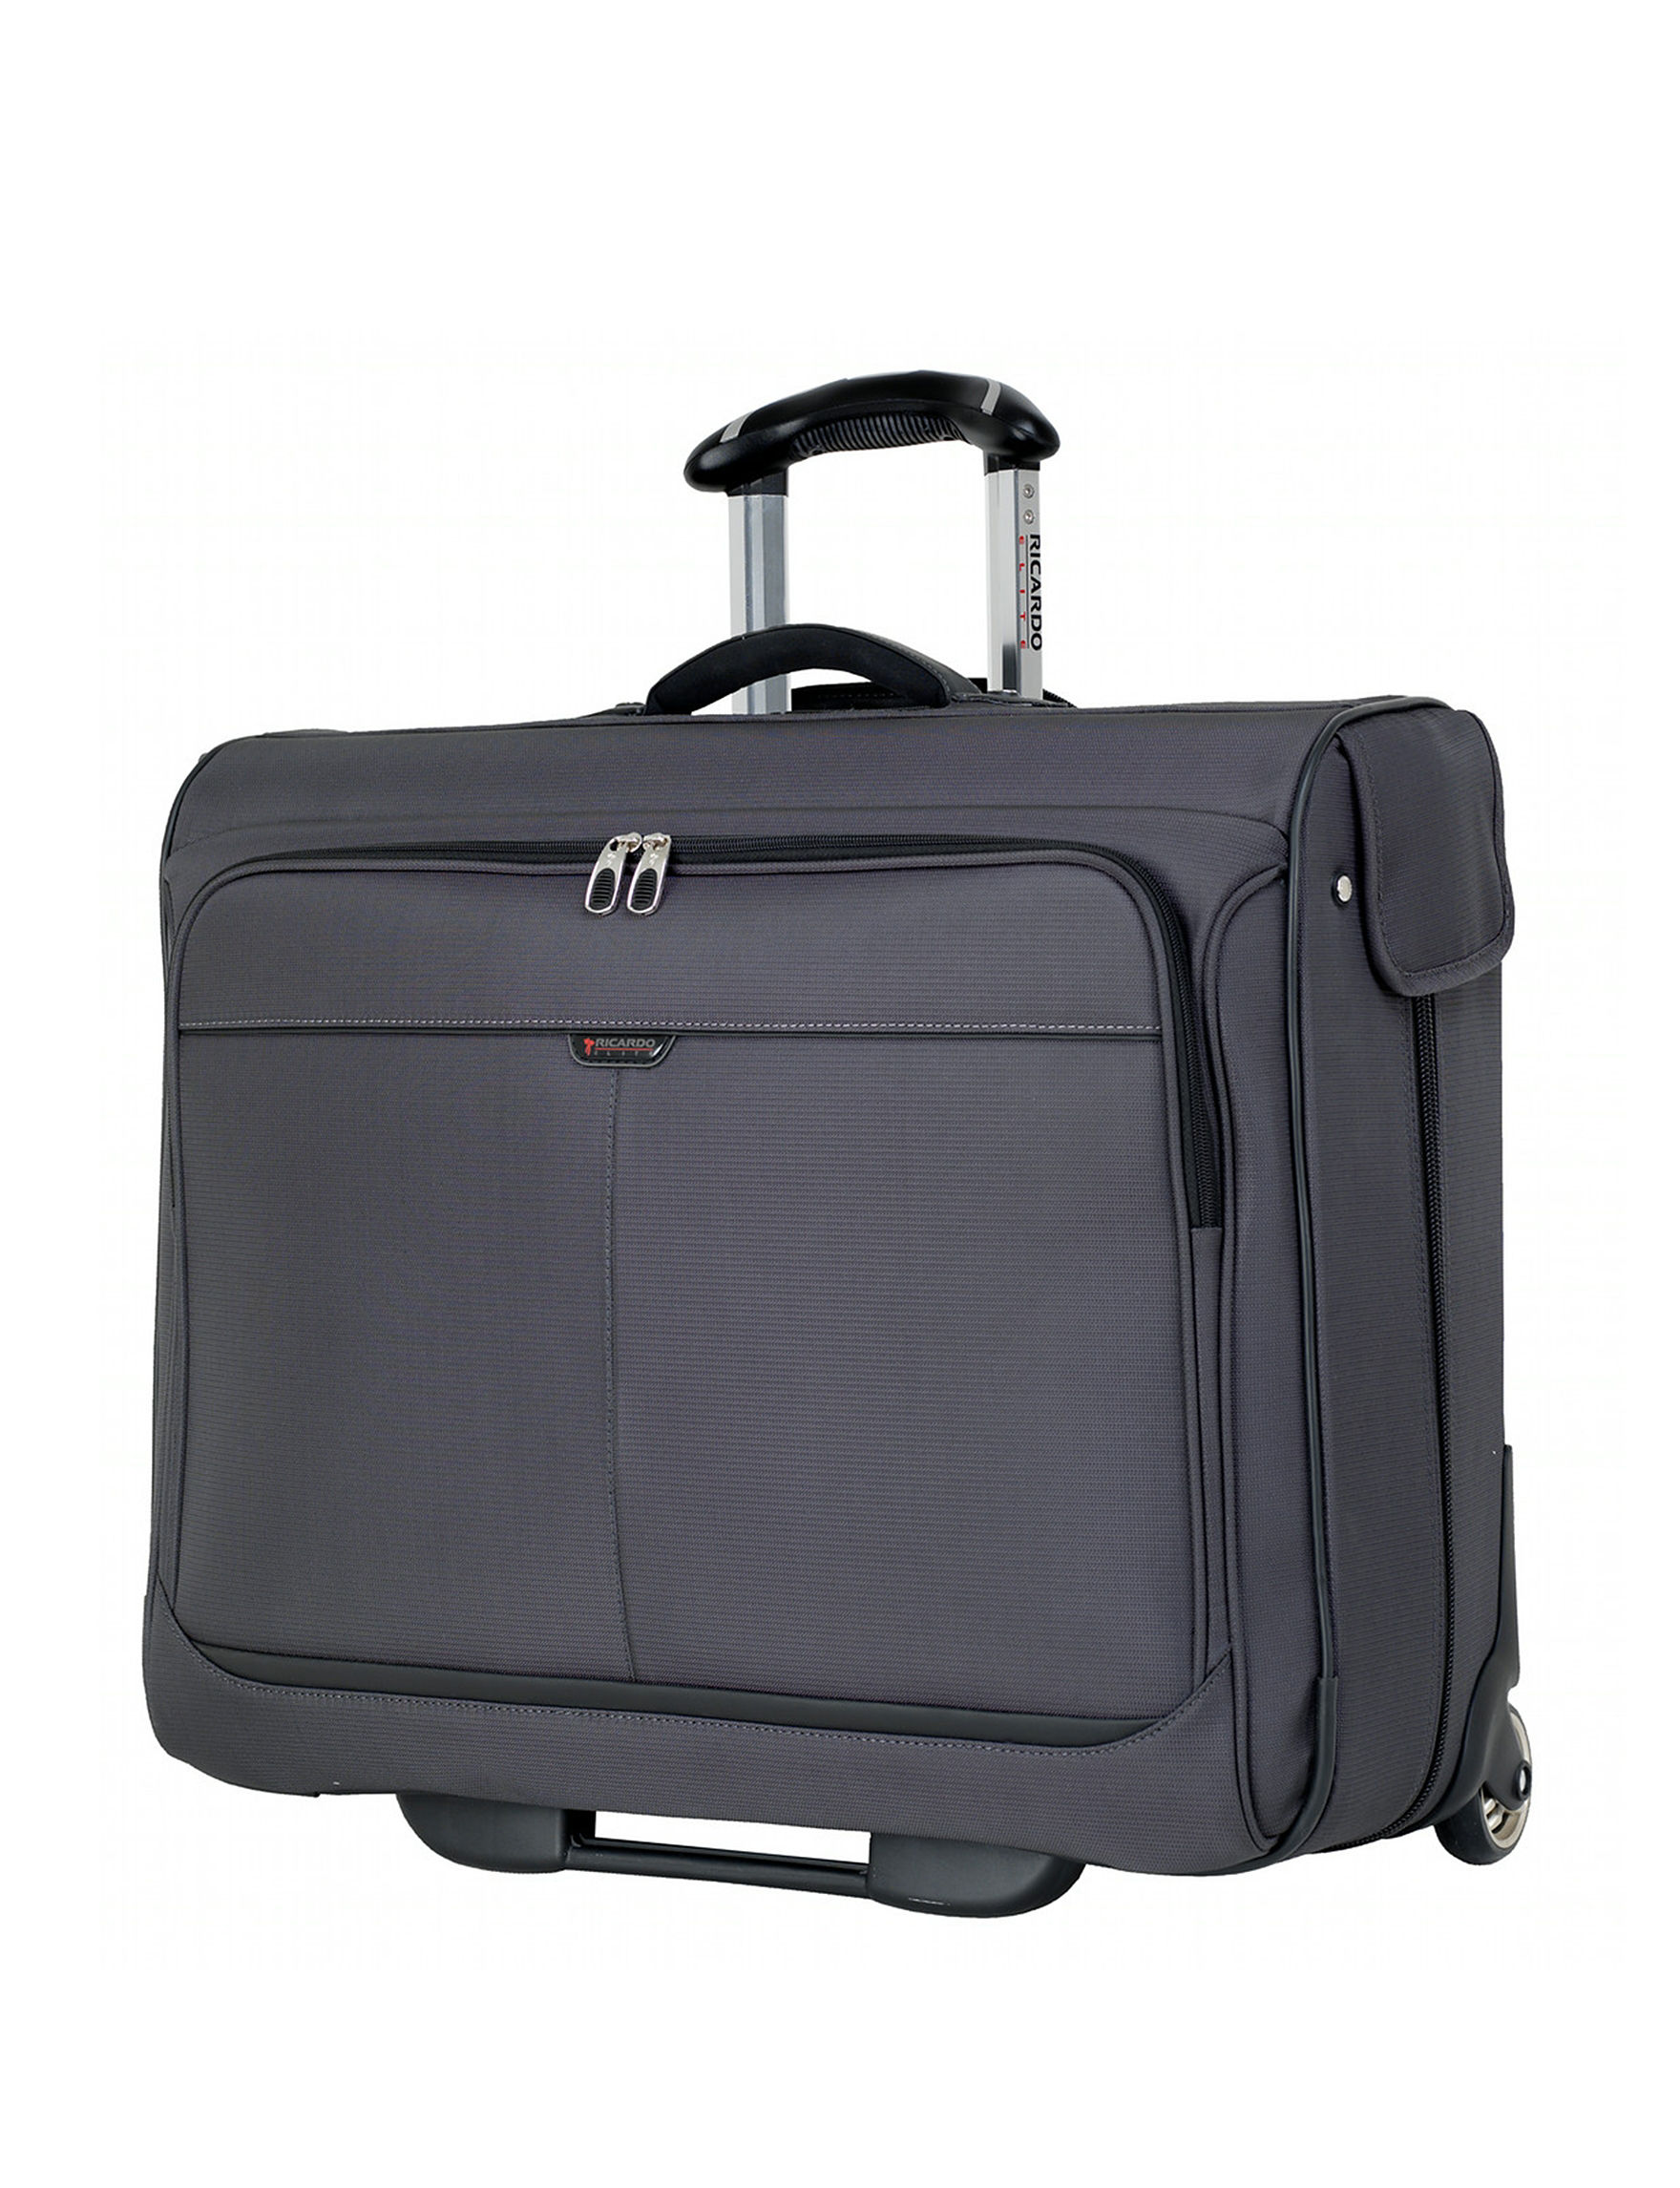 Ricardo Gray Garment Bags